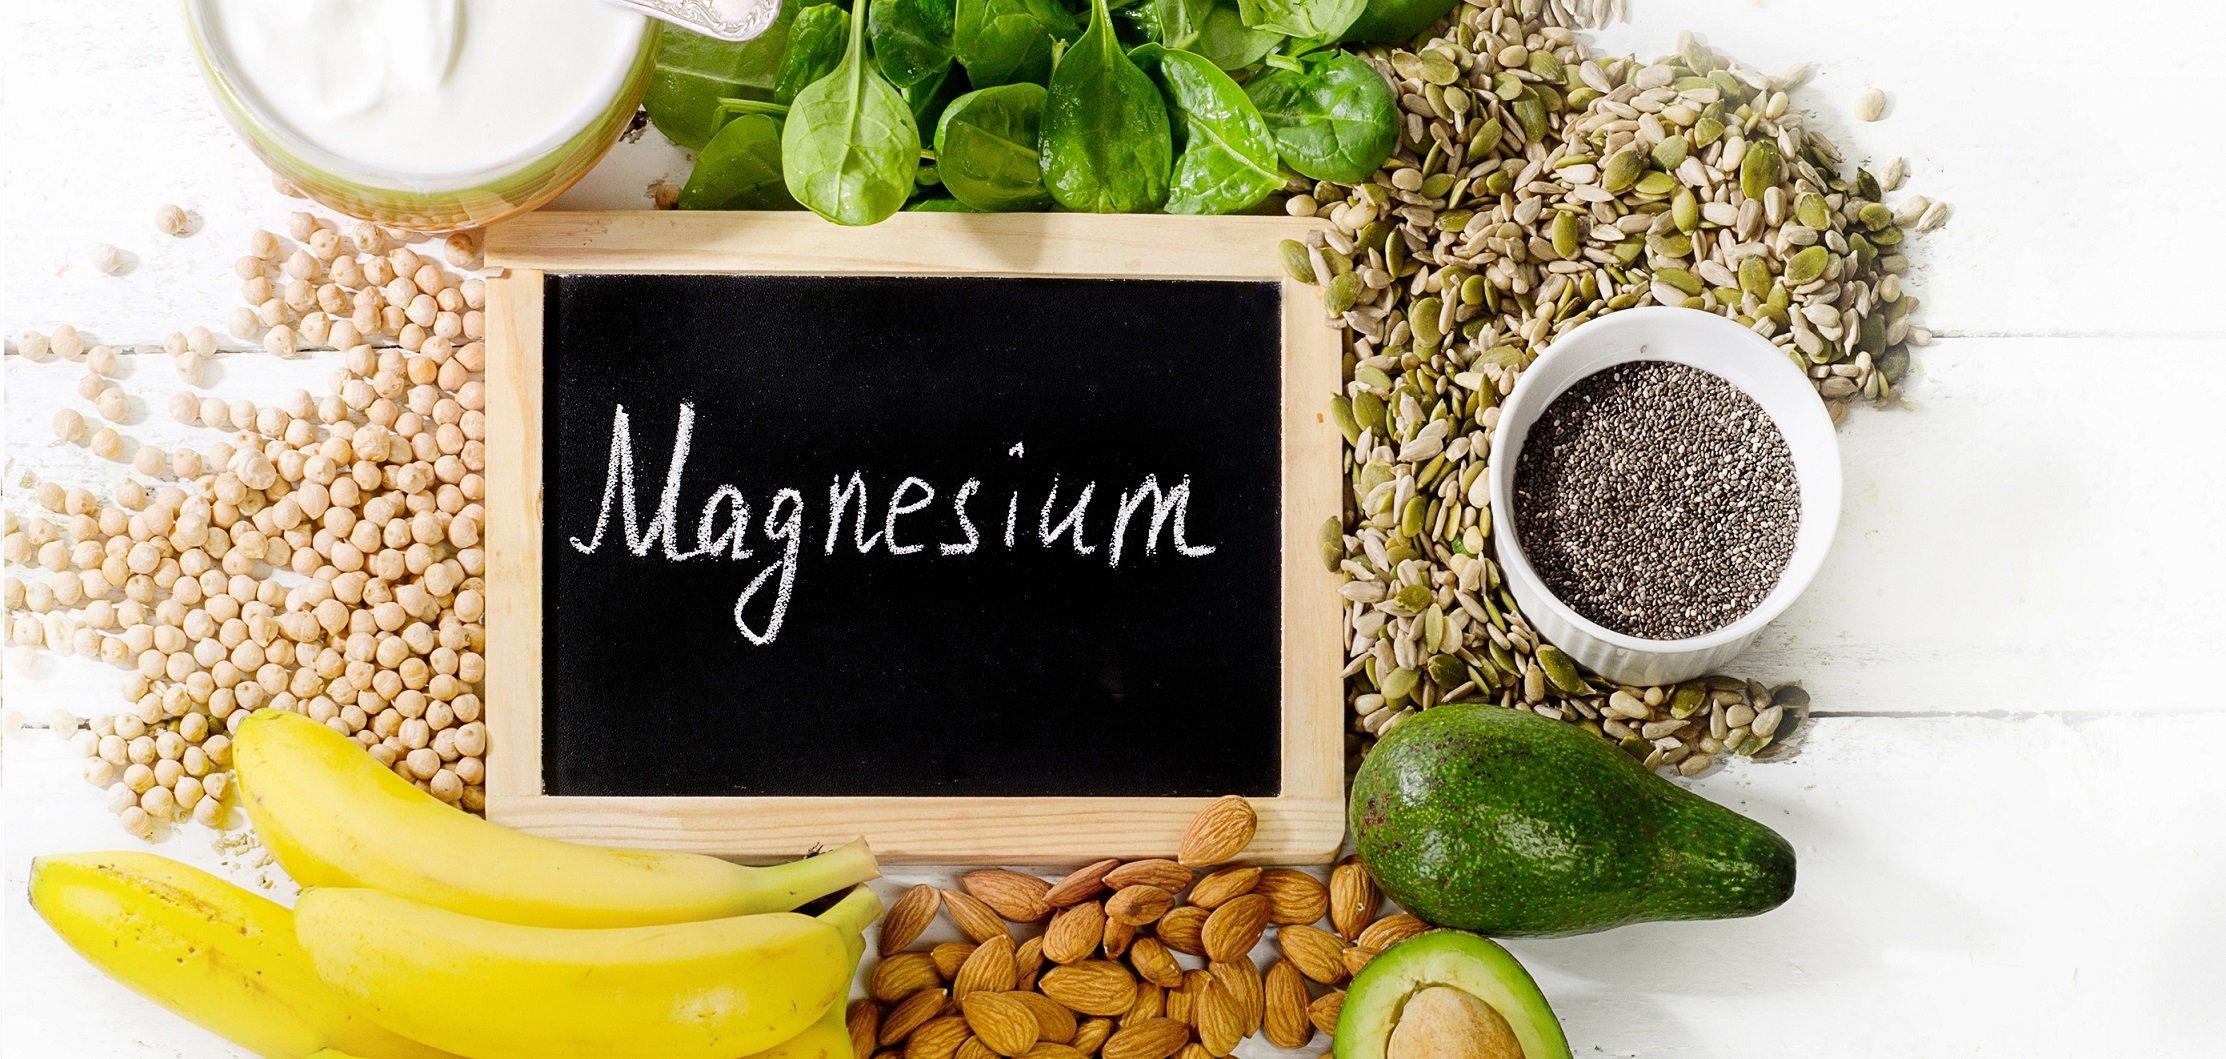 magnesium-3.jpg